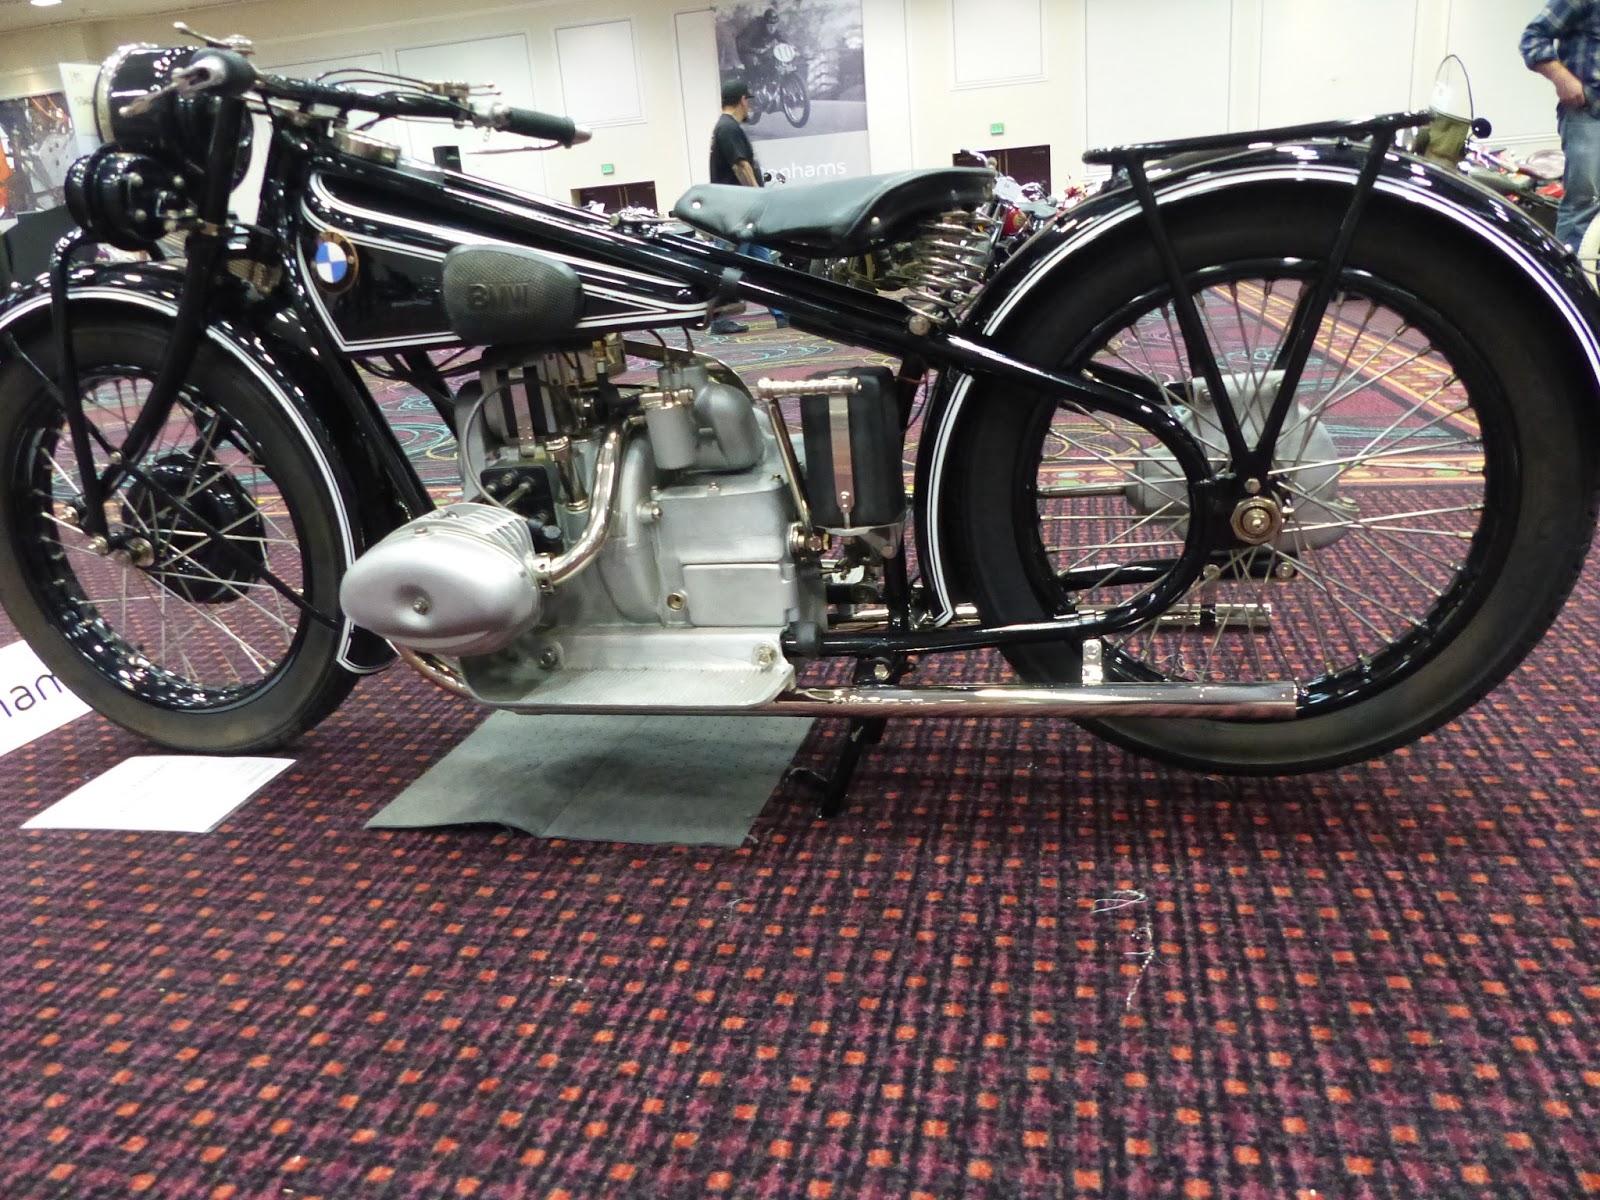 Evel Knievel Bike At Bonham S Las Vegas Moto Auction: OldMotoDude: 1928 BMW R57 Sold For $100,000 At The 2016